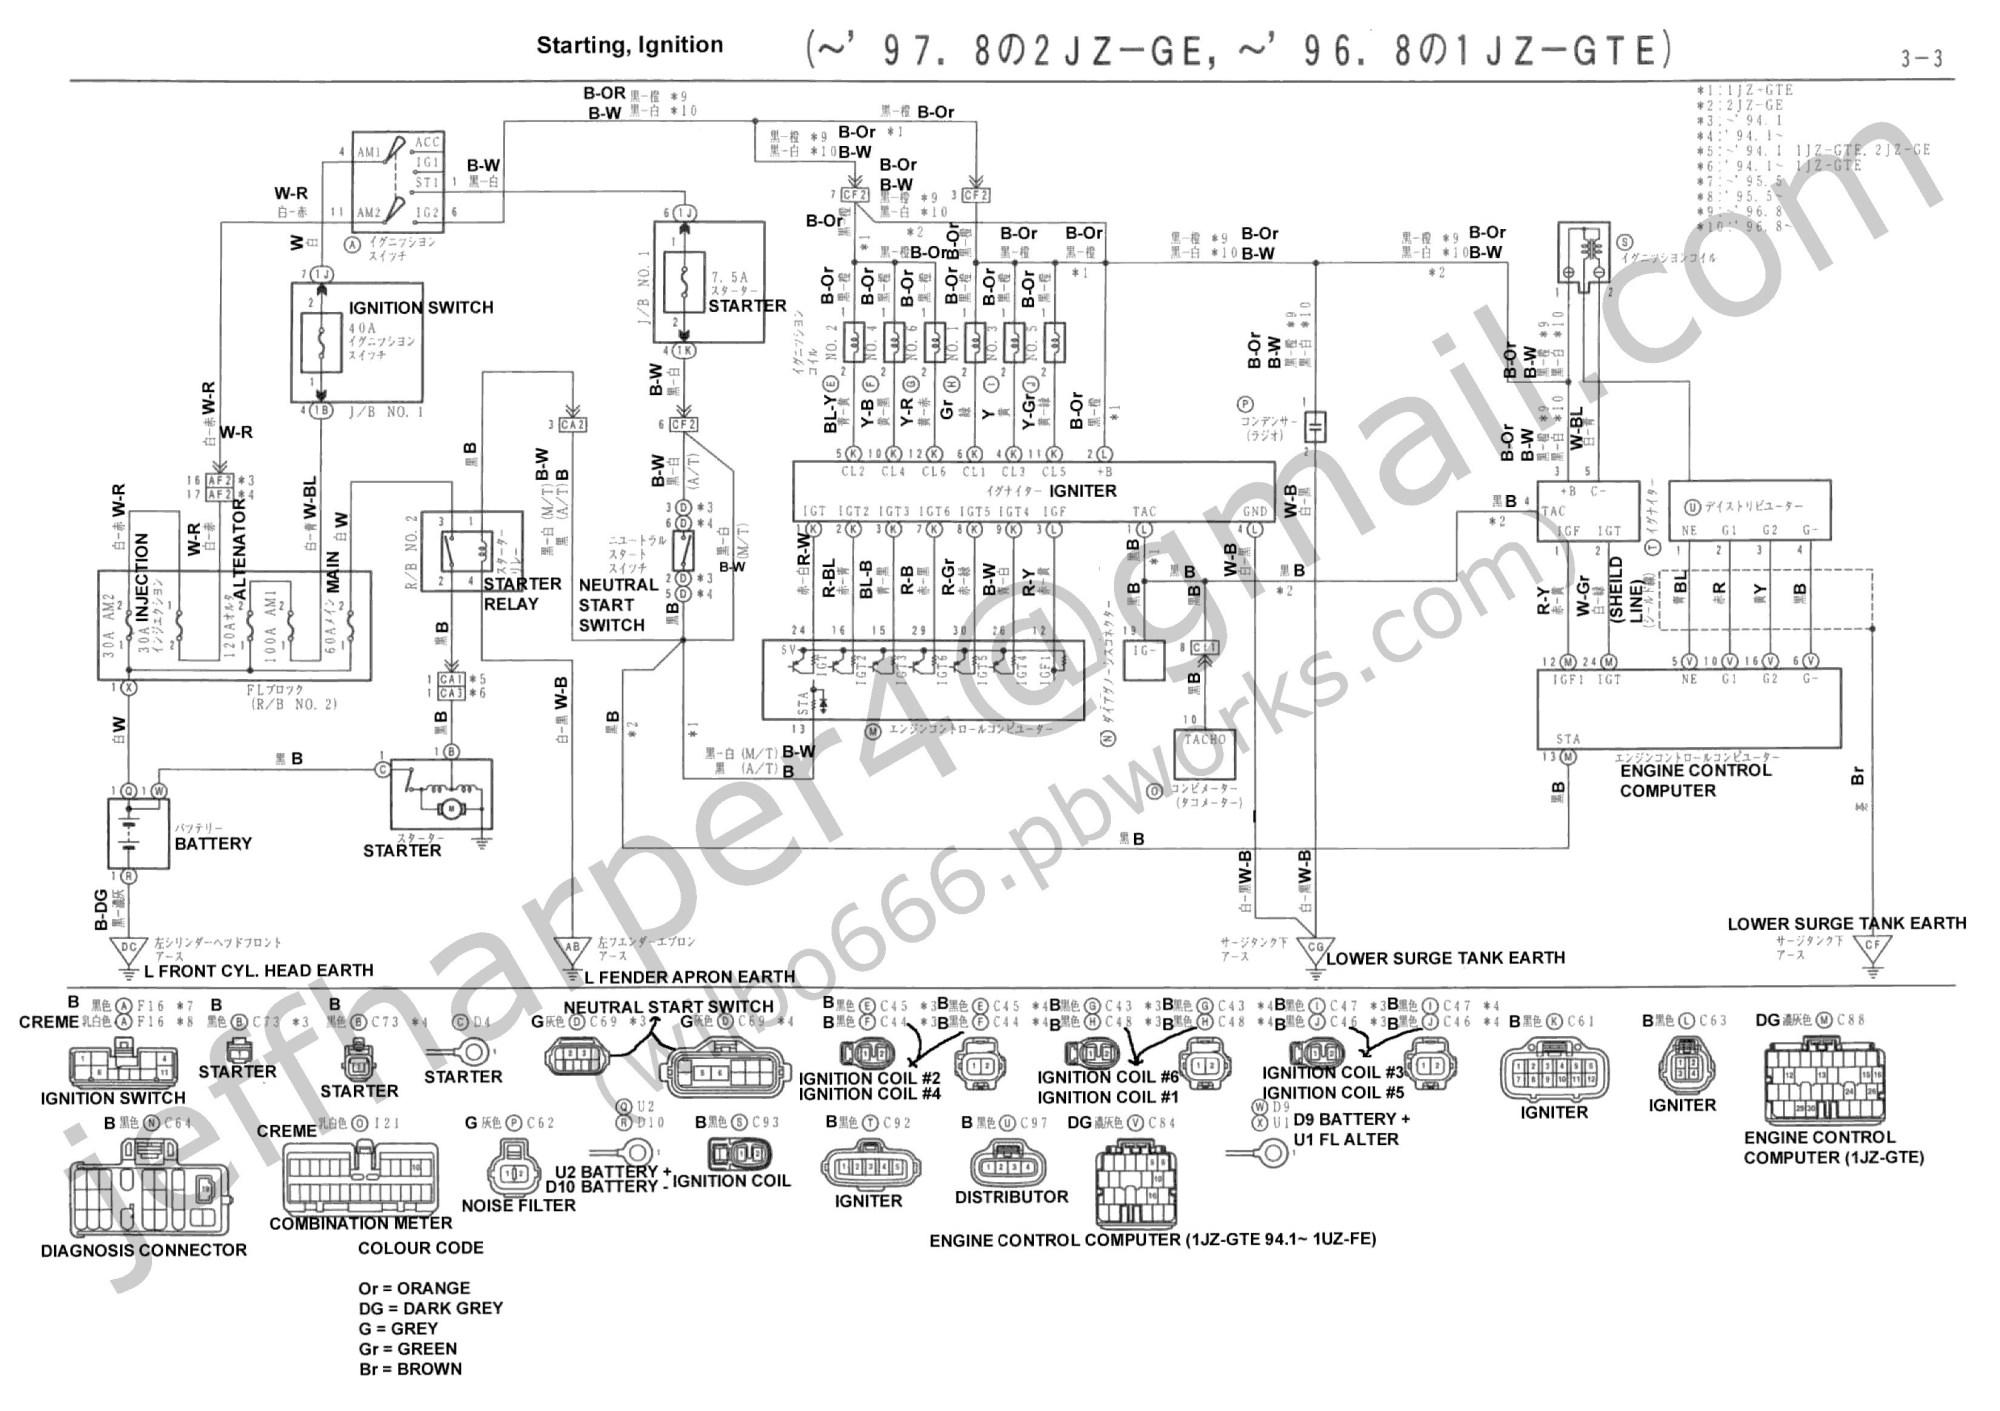 hight resolution of 1991 toyota corolla engine diagram 1992 toyota pickup engine diagram of 1991 toyota corolla engine diagram